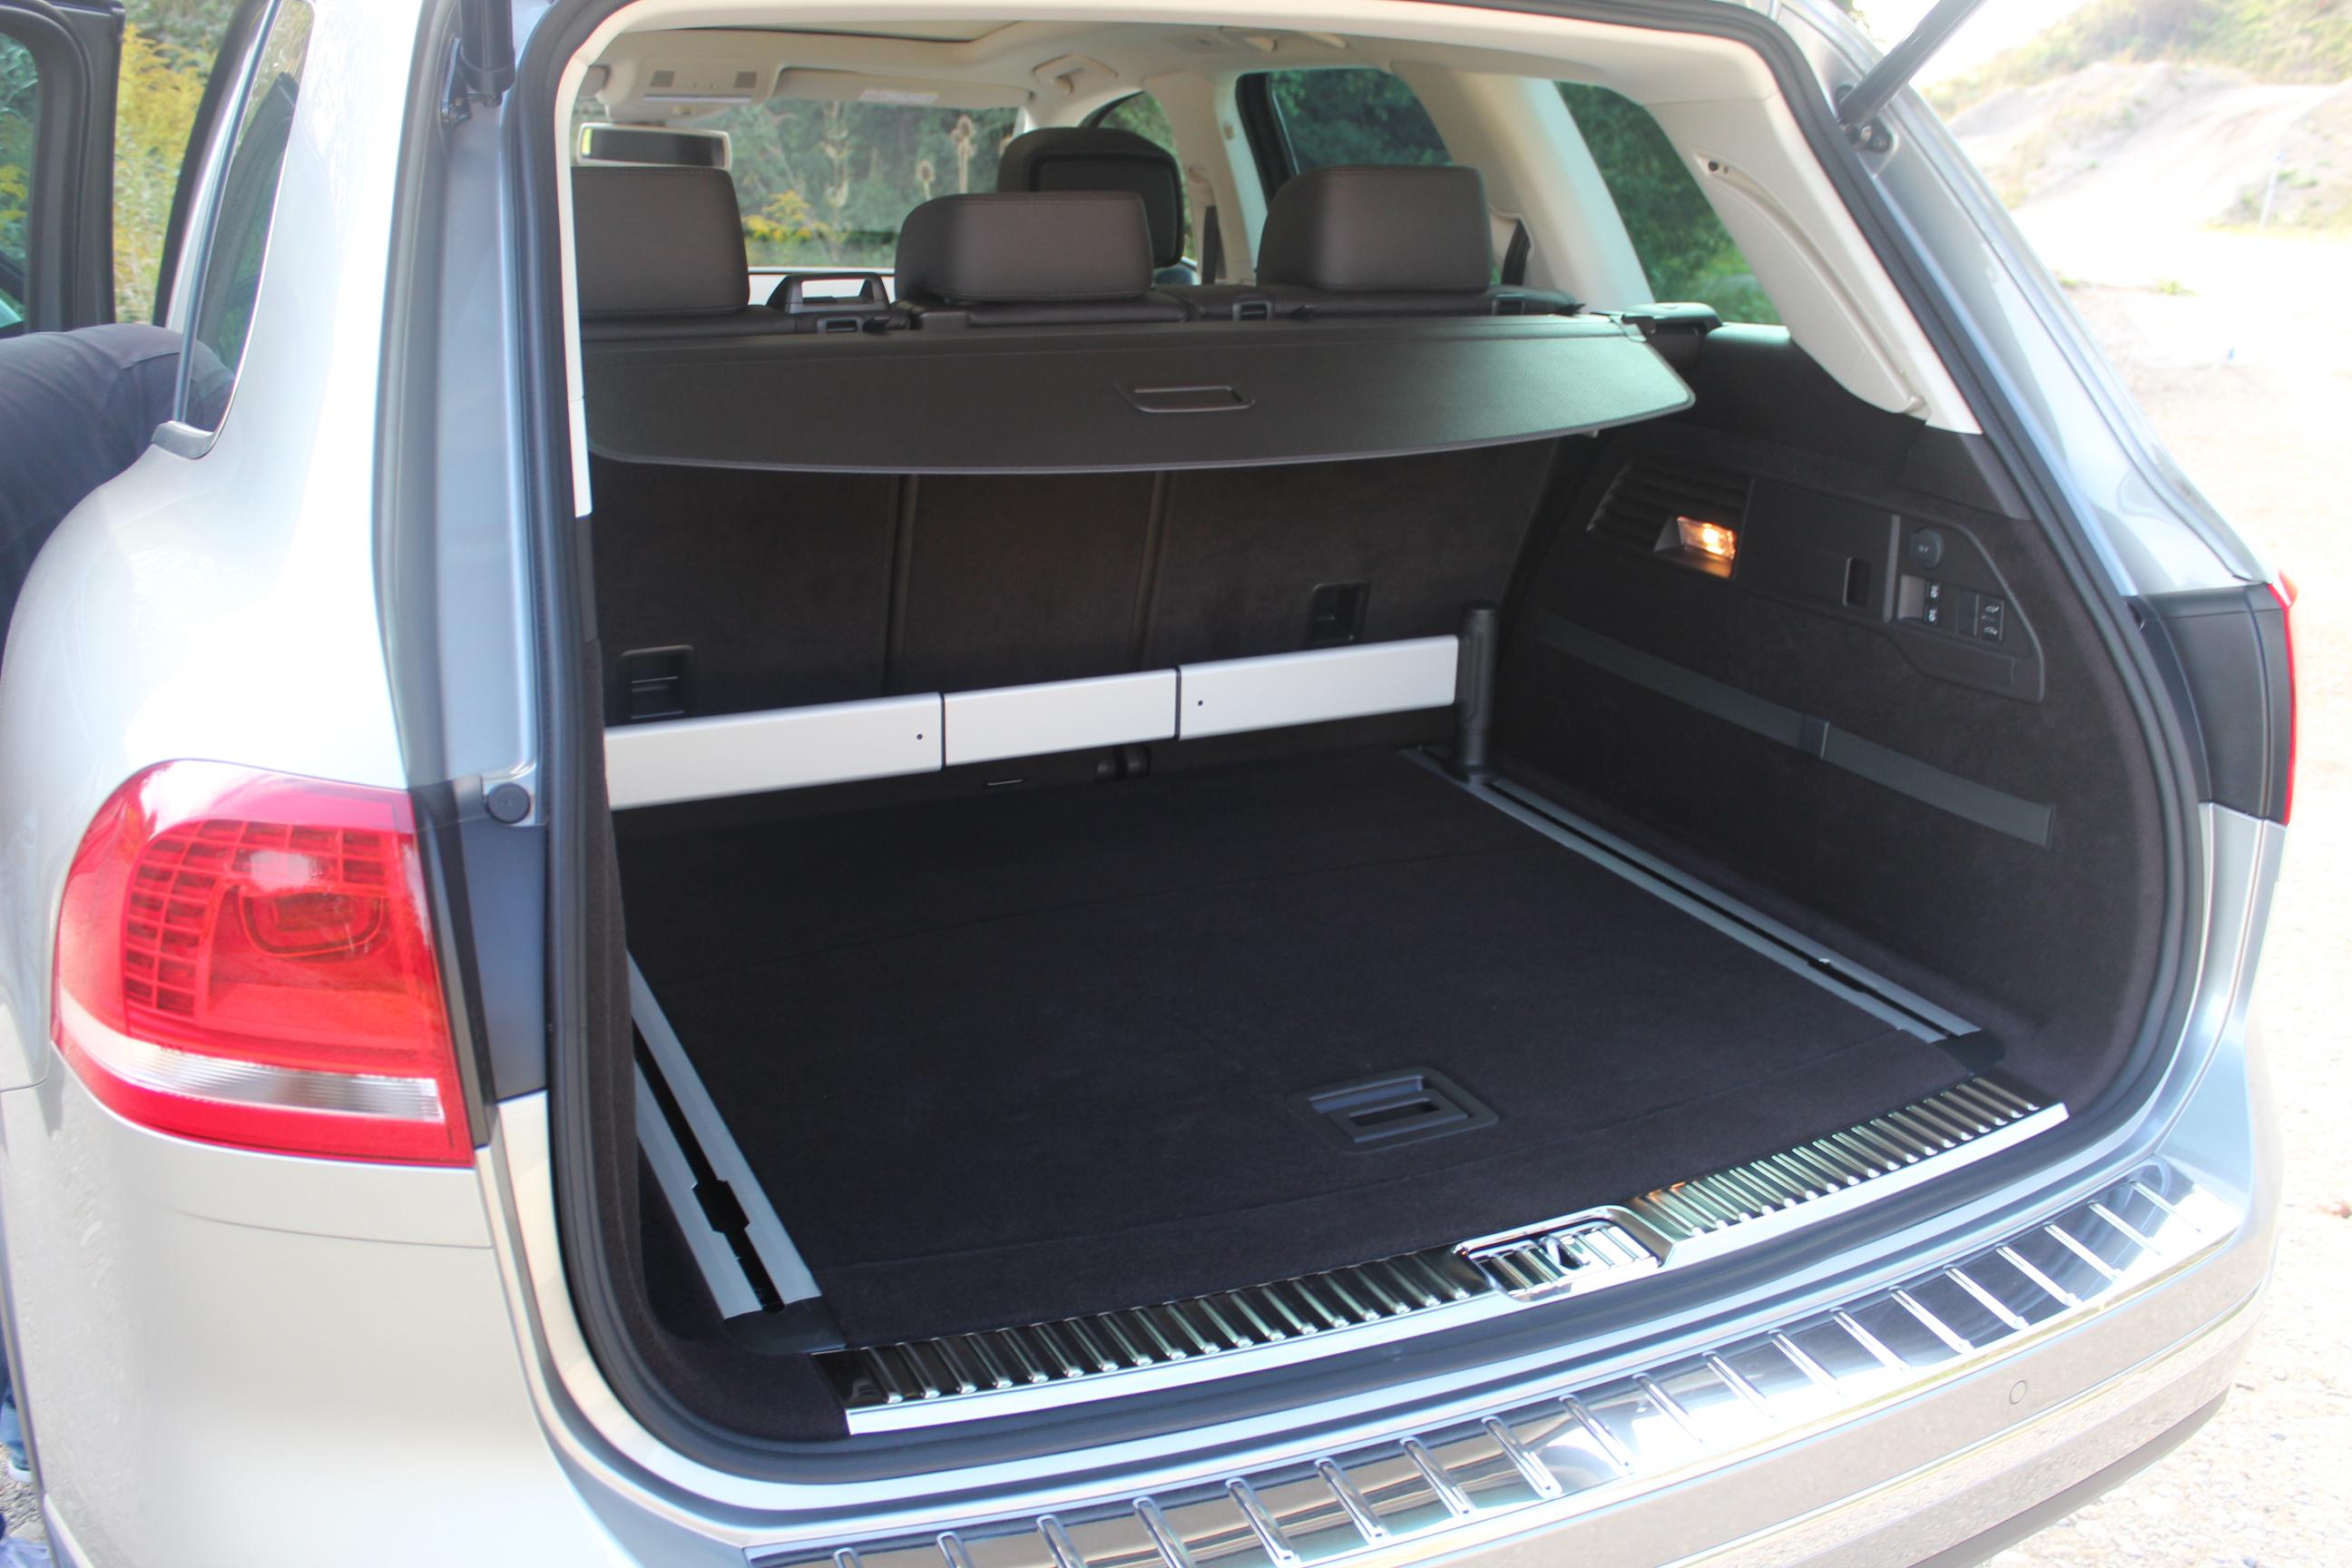 essai vid o volkswagen touareg restyl l g re mise jour. Black Bedroom Furniture Sets. Home Design Ideas